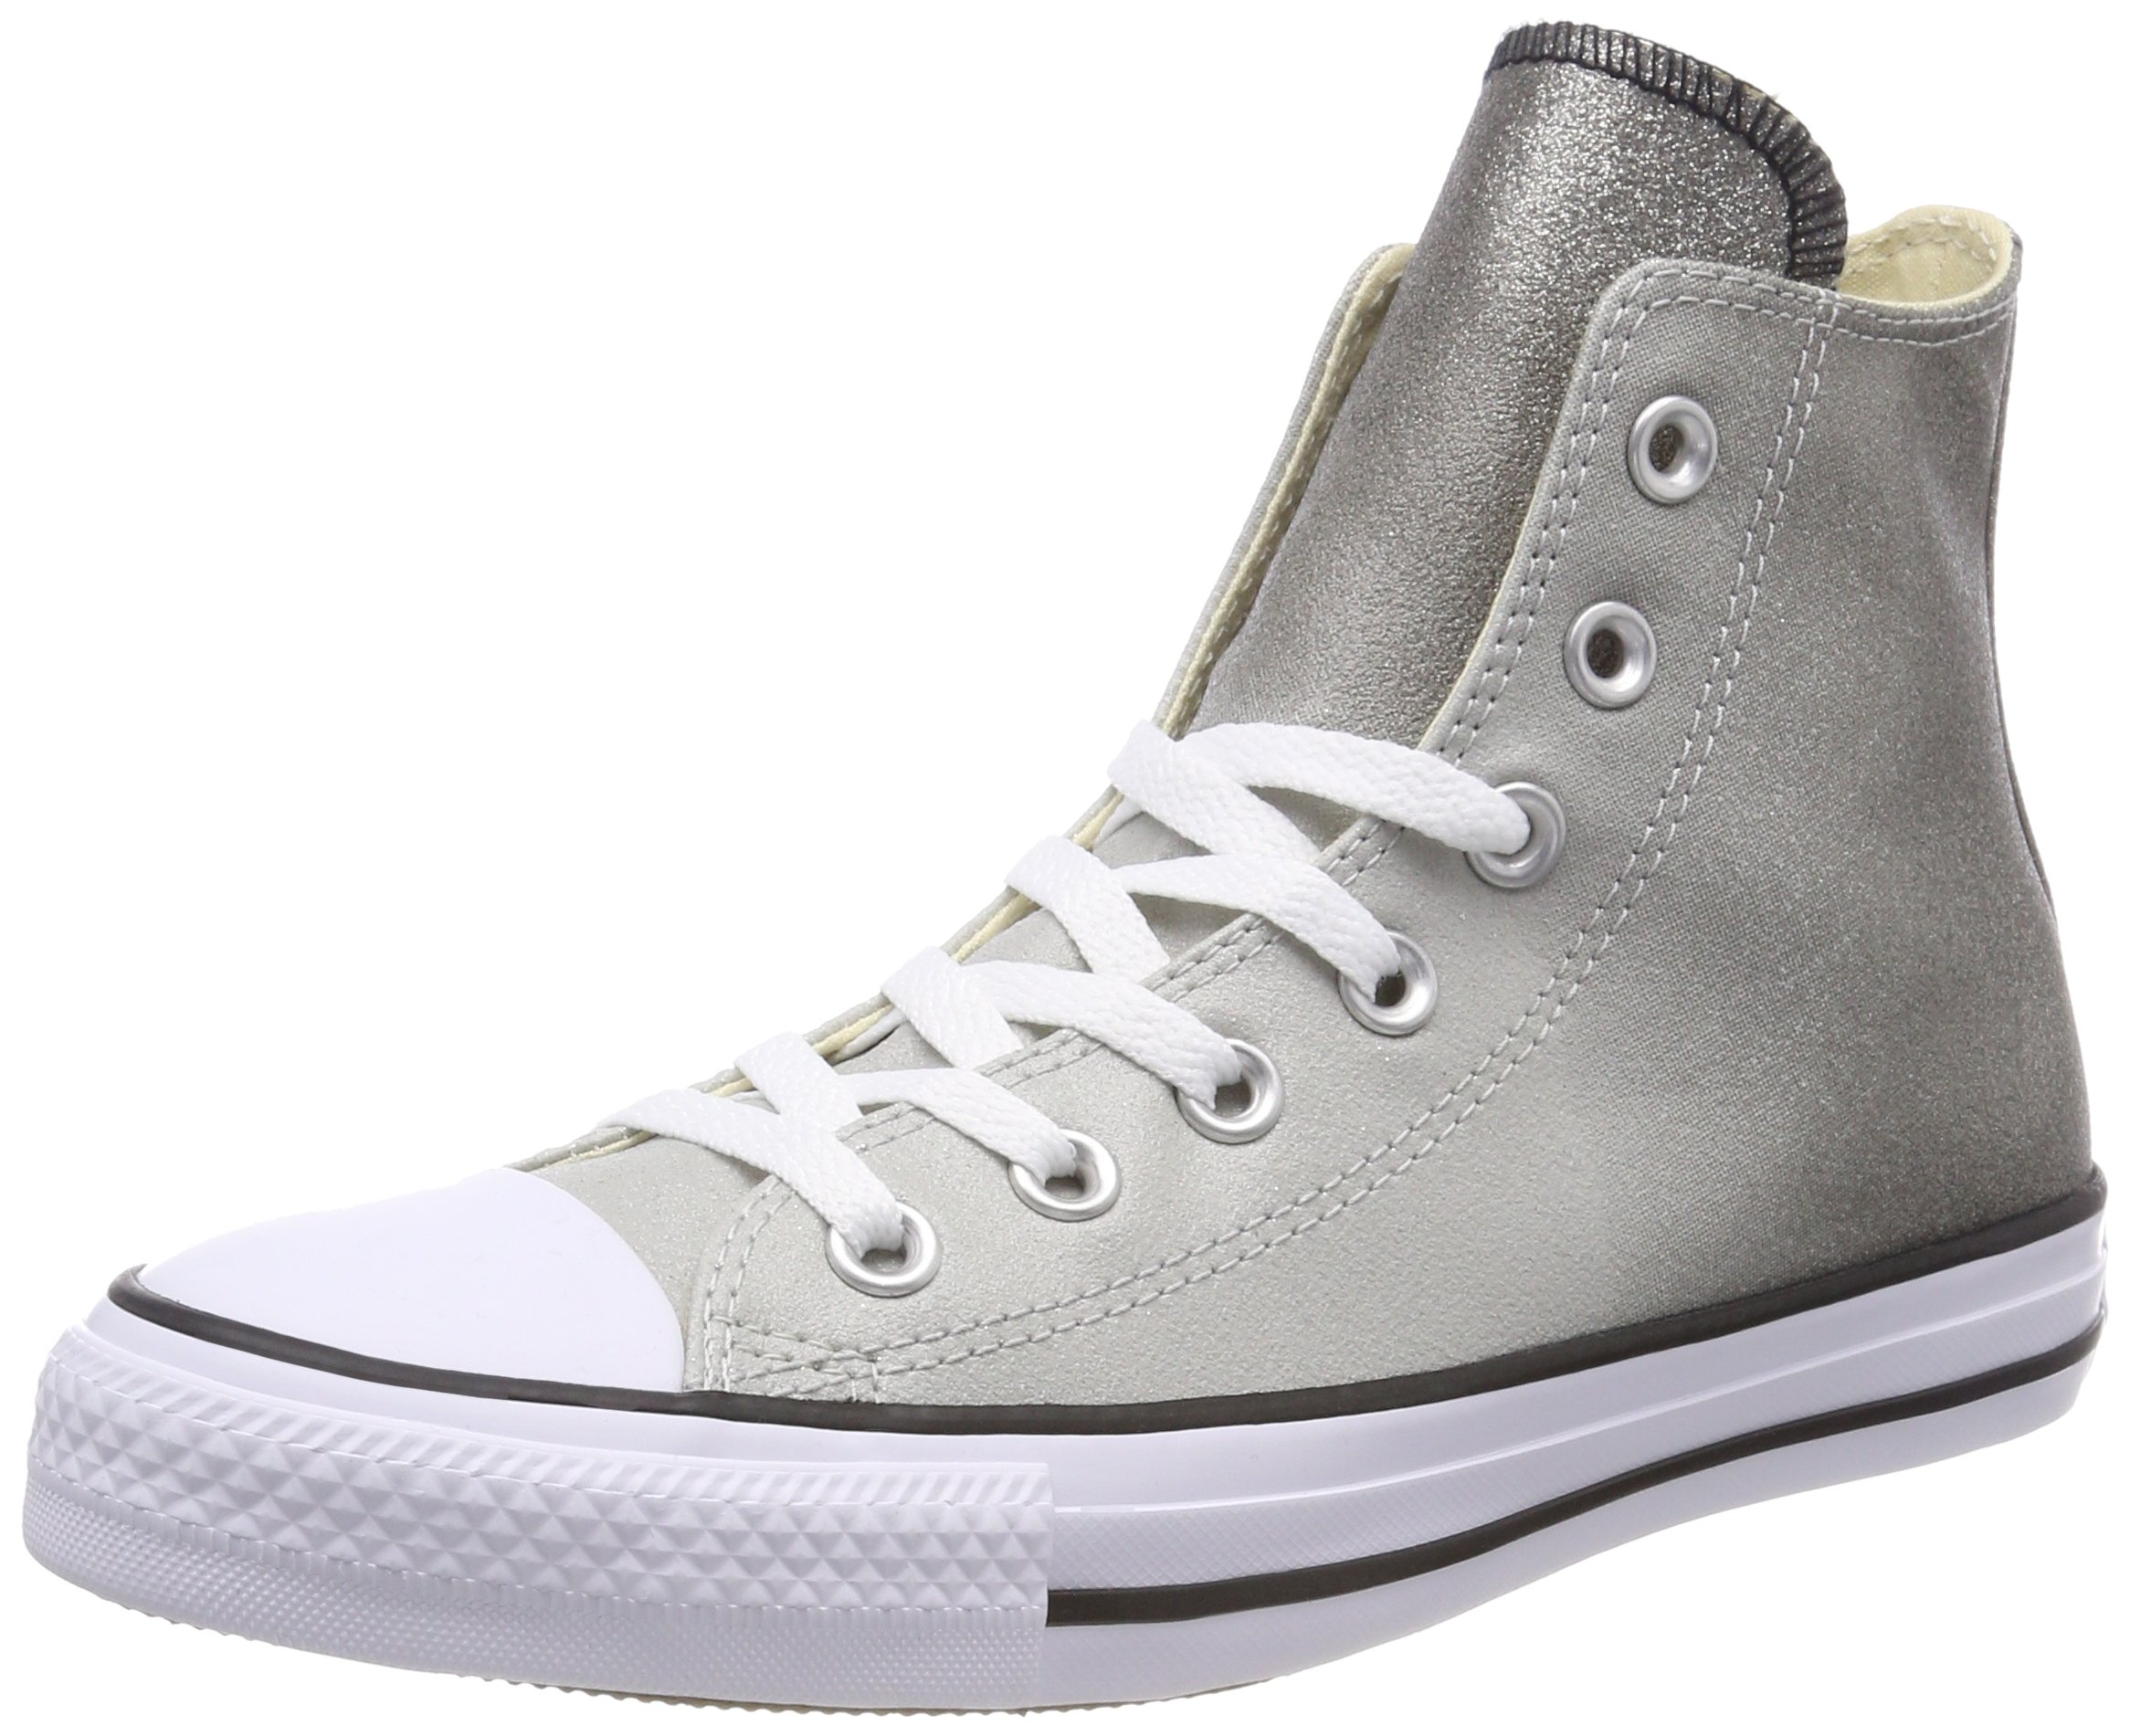 4c49e2f118d2 Converse Chuck Taylorr All Star Canvas Ombre Metallics Hi Ash  Grey Black White Women